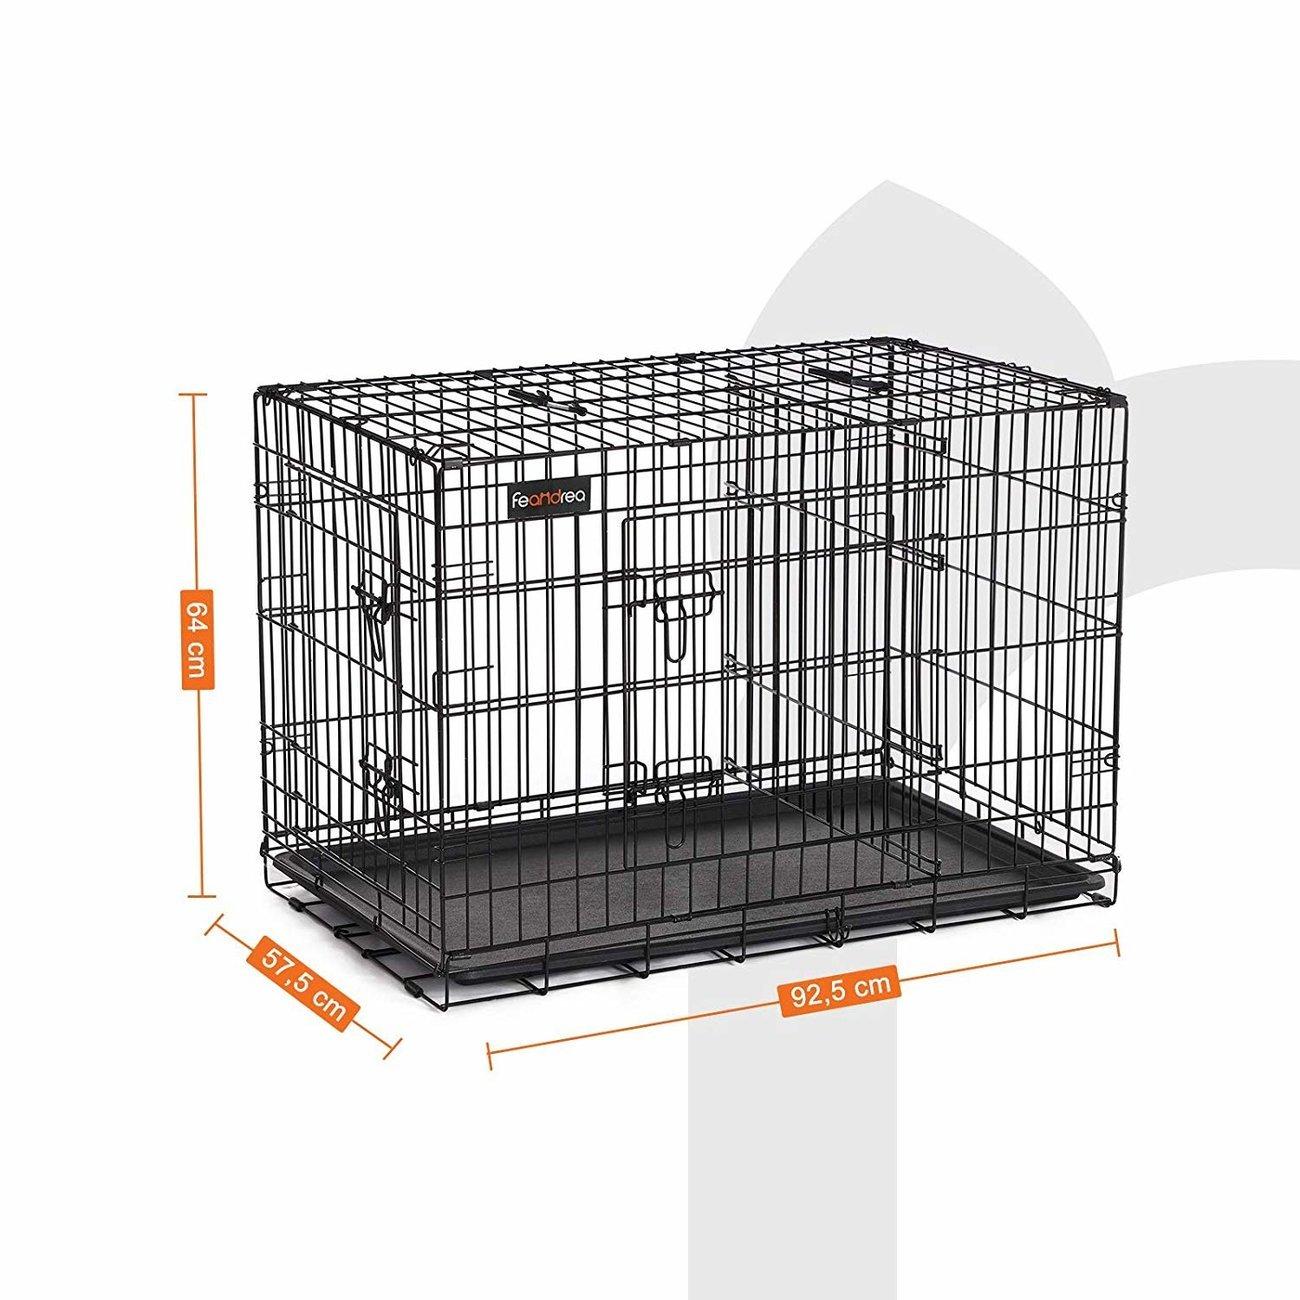 SONGMICS FEANDREA Hundekäfig, Hundebox mit Trennwand, 2 Türen, 92.5 x 57.5 x 64 cm (L x B x H)